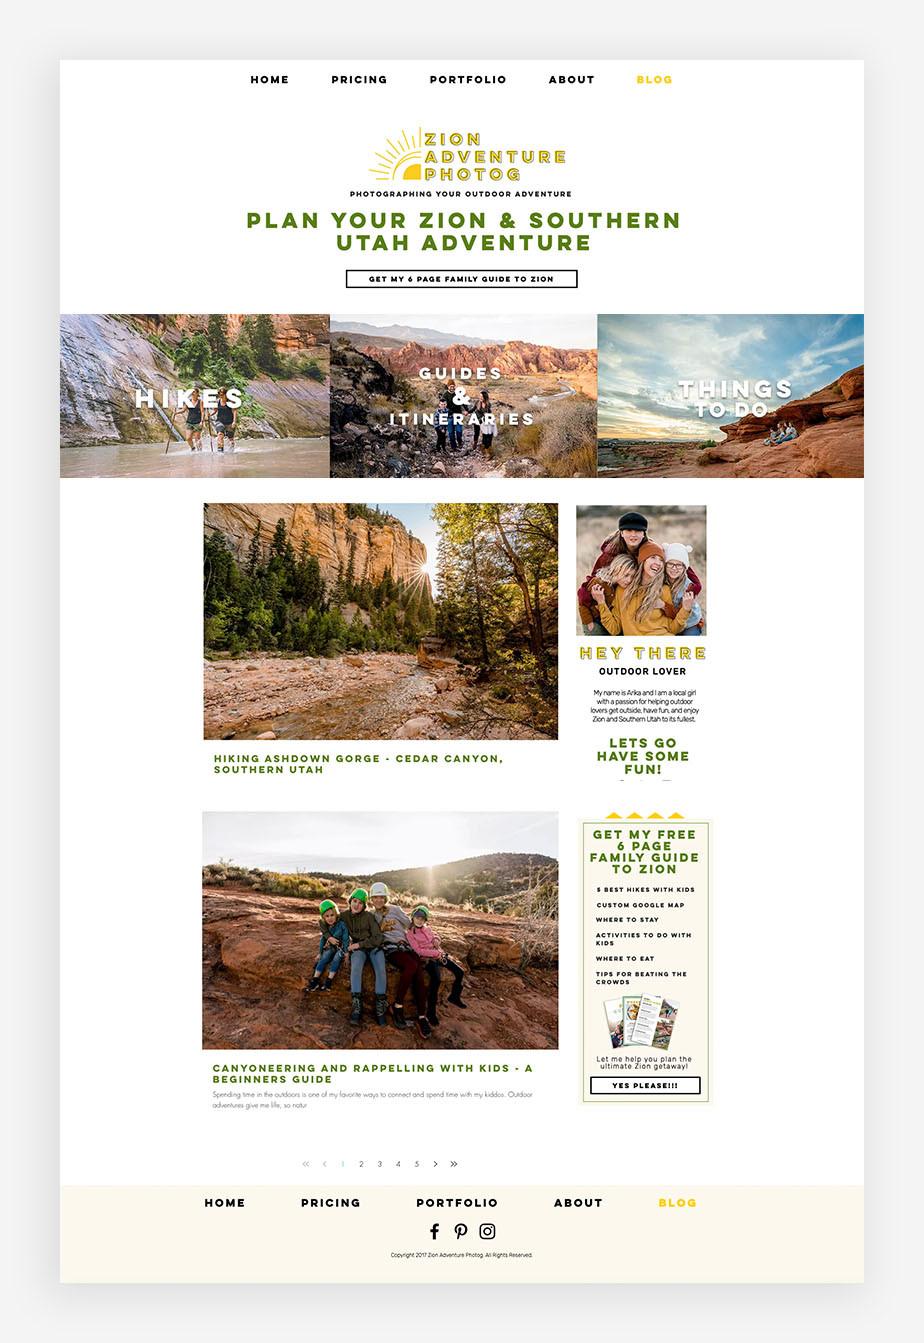 blog examples Zion Adventure Photog Blog